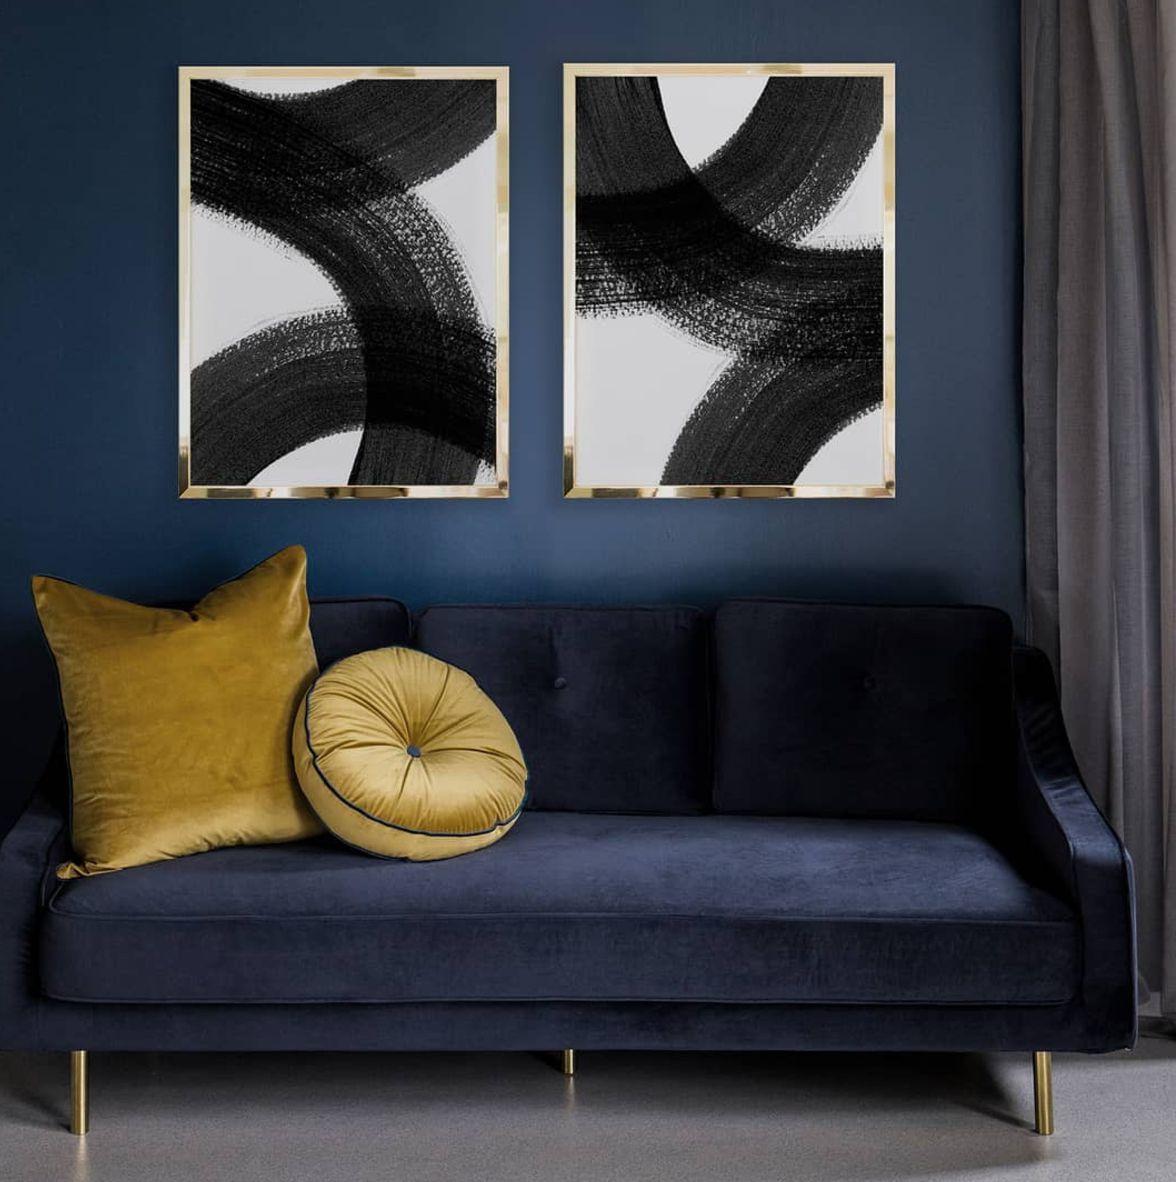 Blue monochrome room